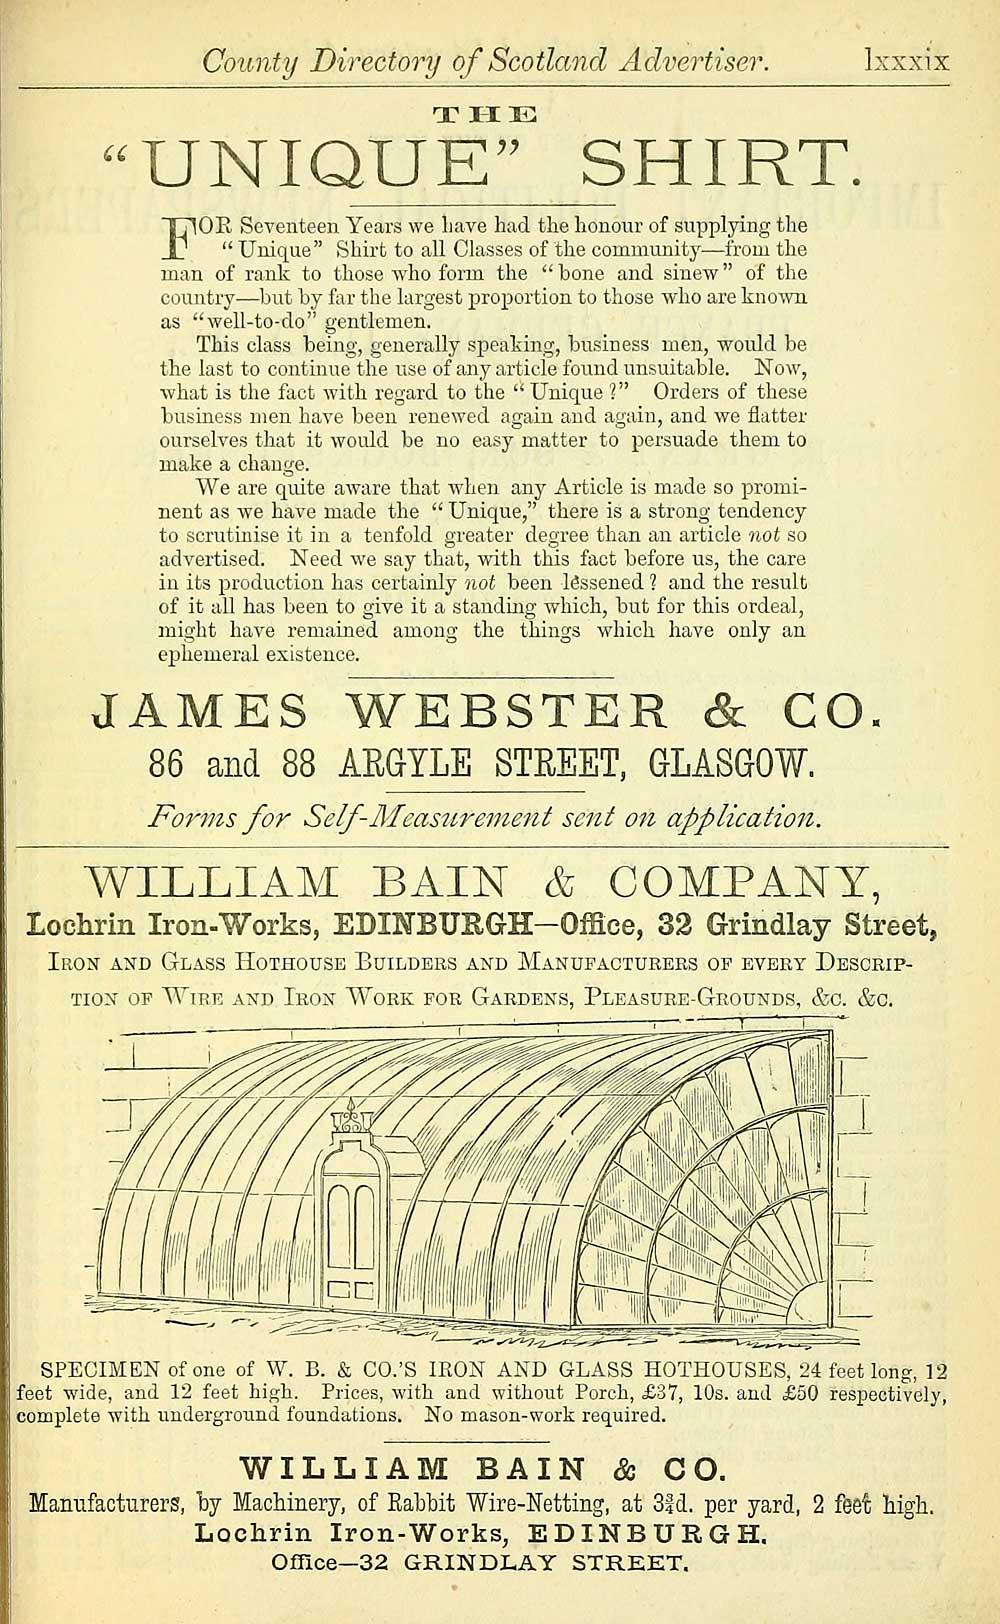 671) - Scotland > 1862, 1868, 1872, 1882-1885, 1893-1896, 1901-1904